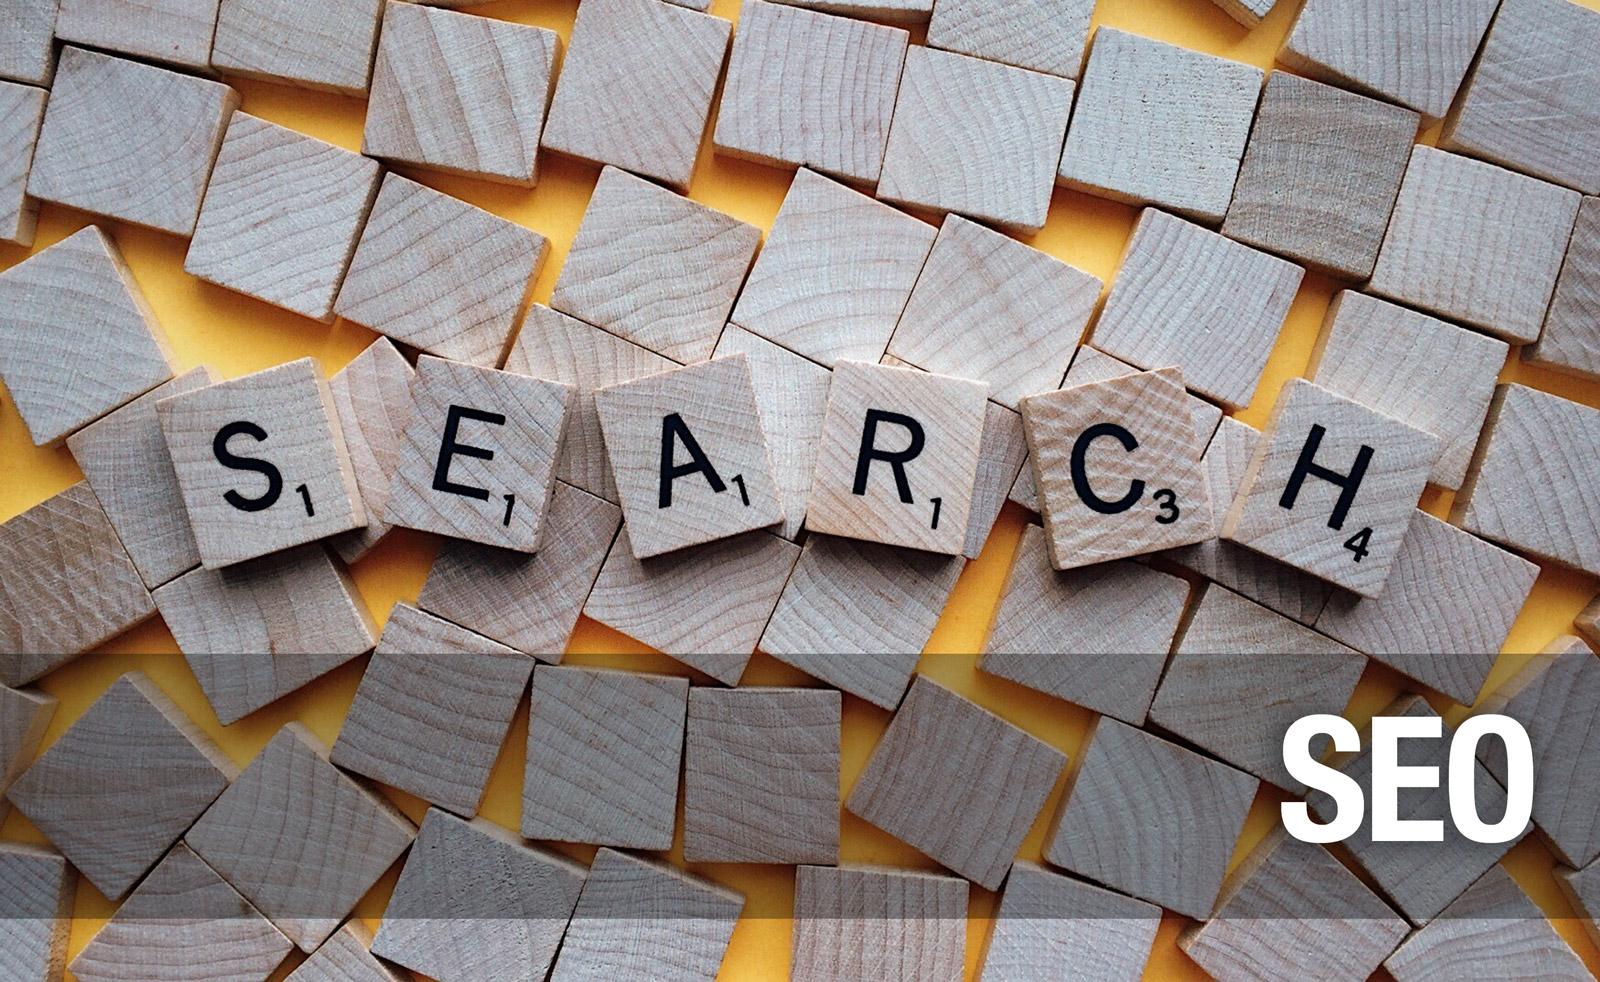 search engine optimisation blocks